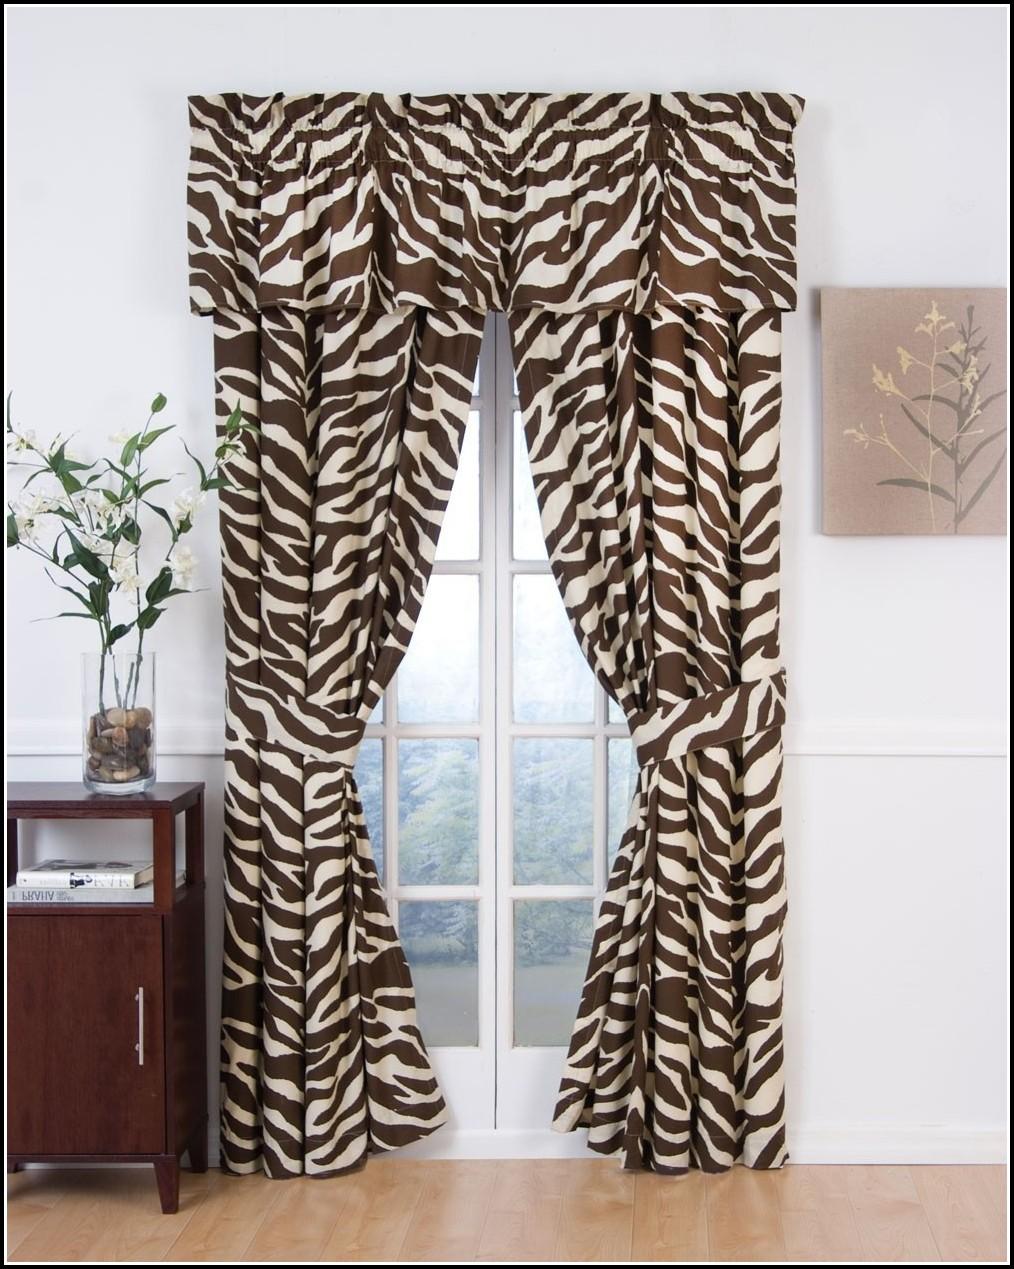 Animal Print Sheer Curtain Panels Curtains Home Design